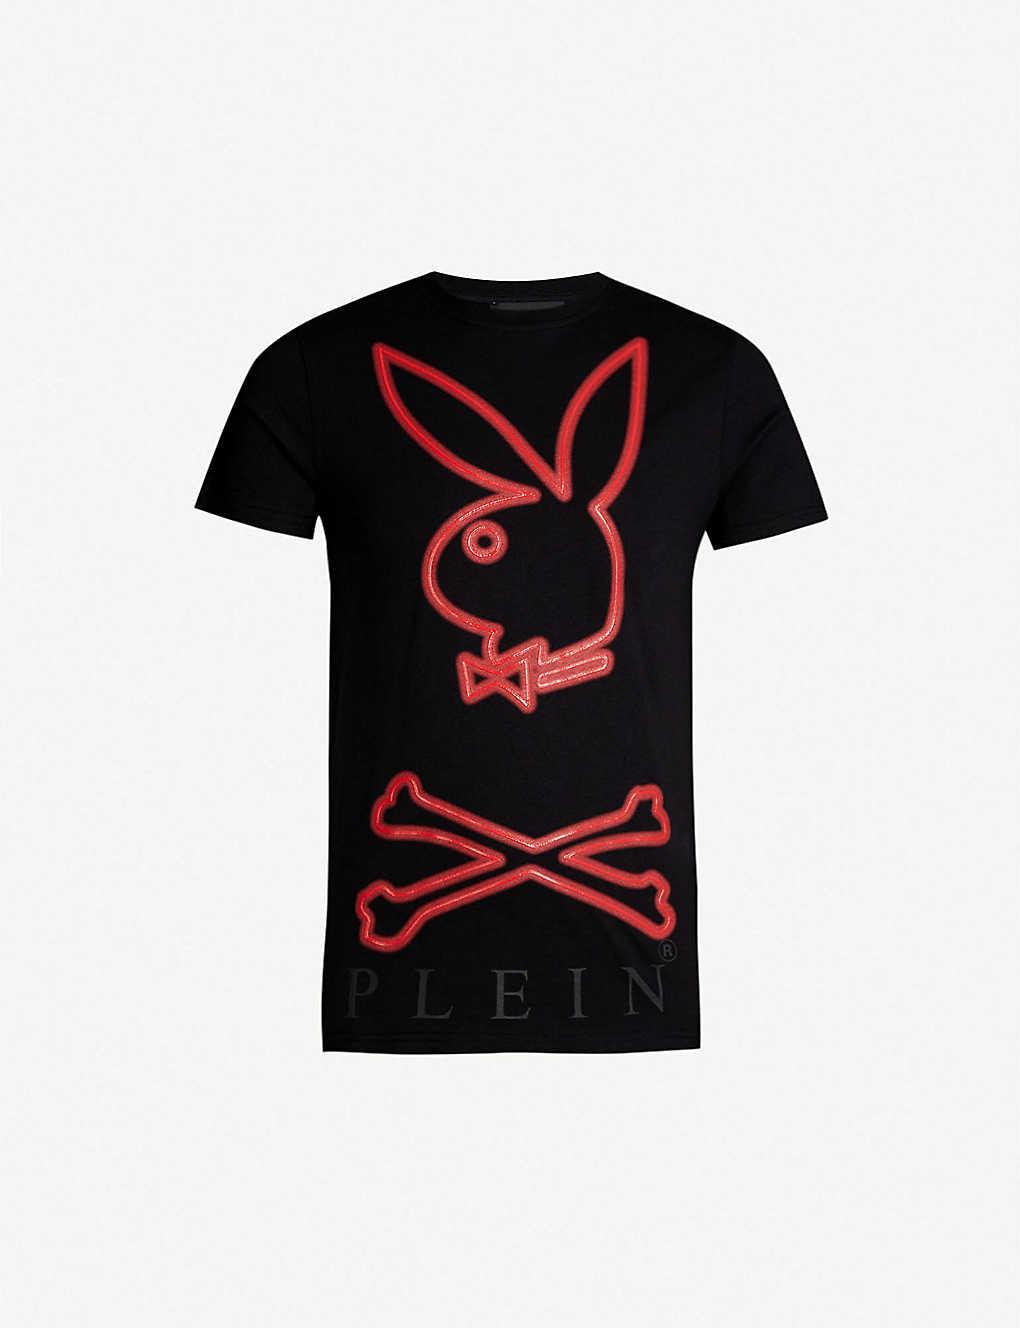 PHILIPP PLEIN - Playboy logo-print cotton-jersey T-shirt ... 072e49e22